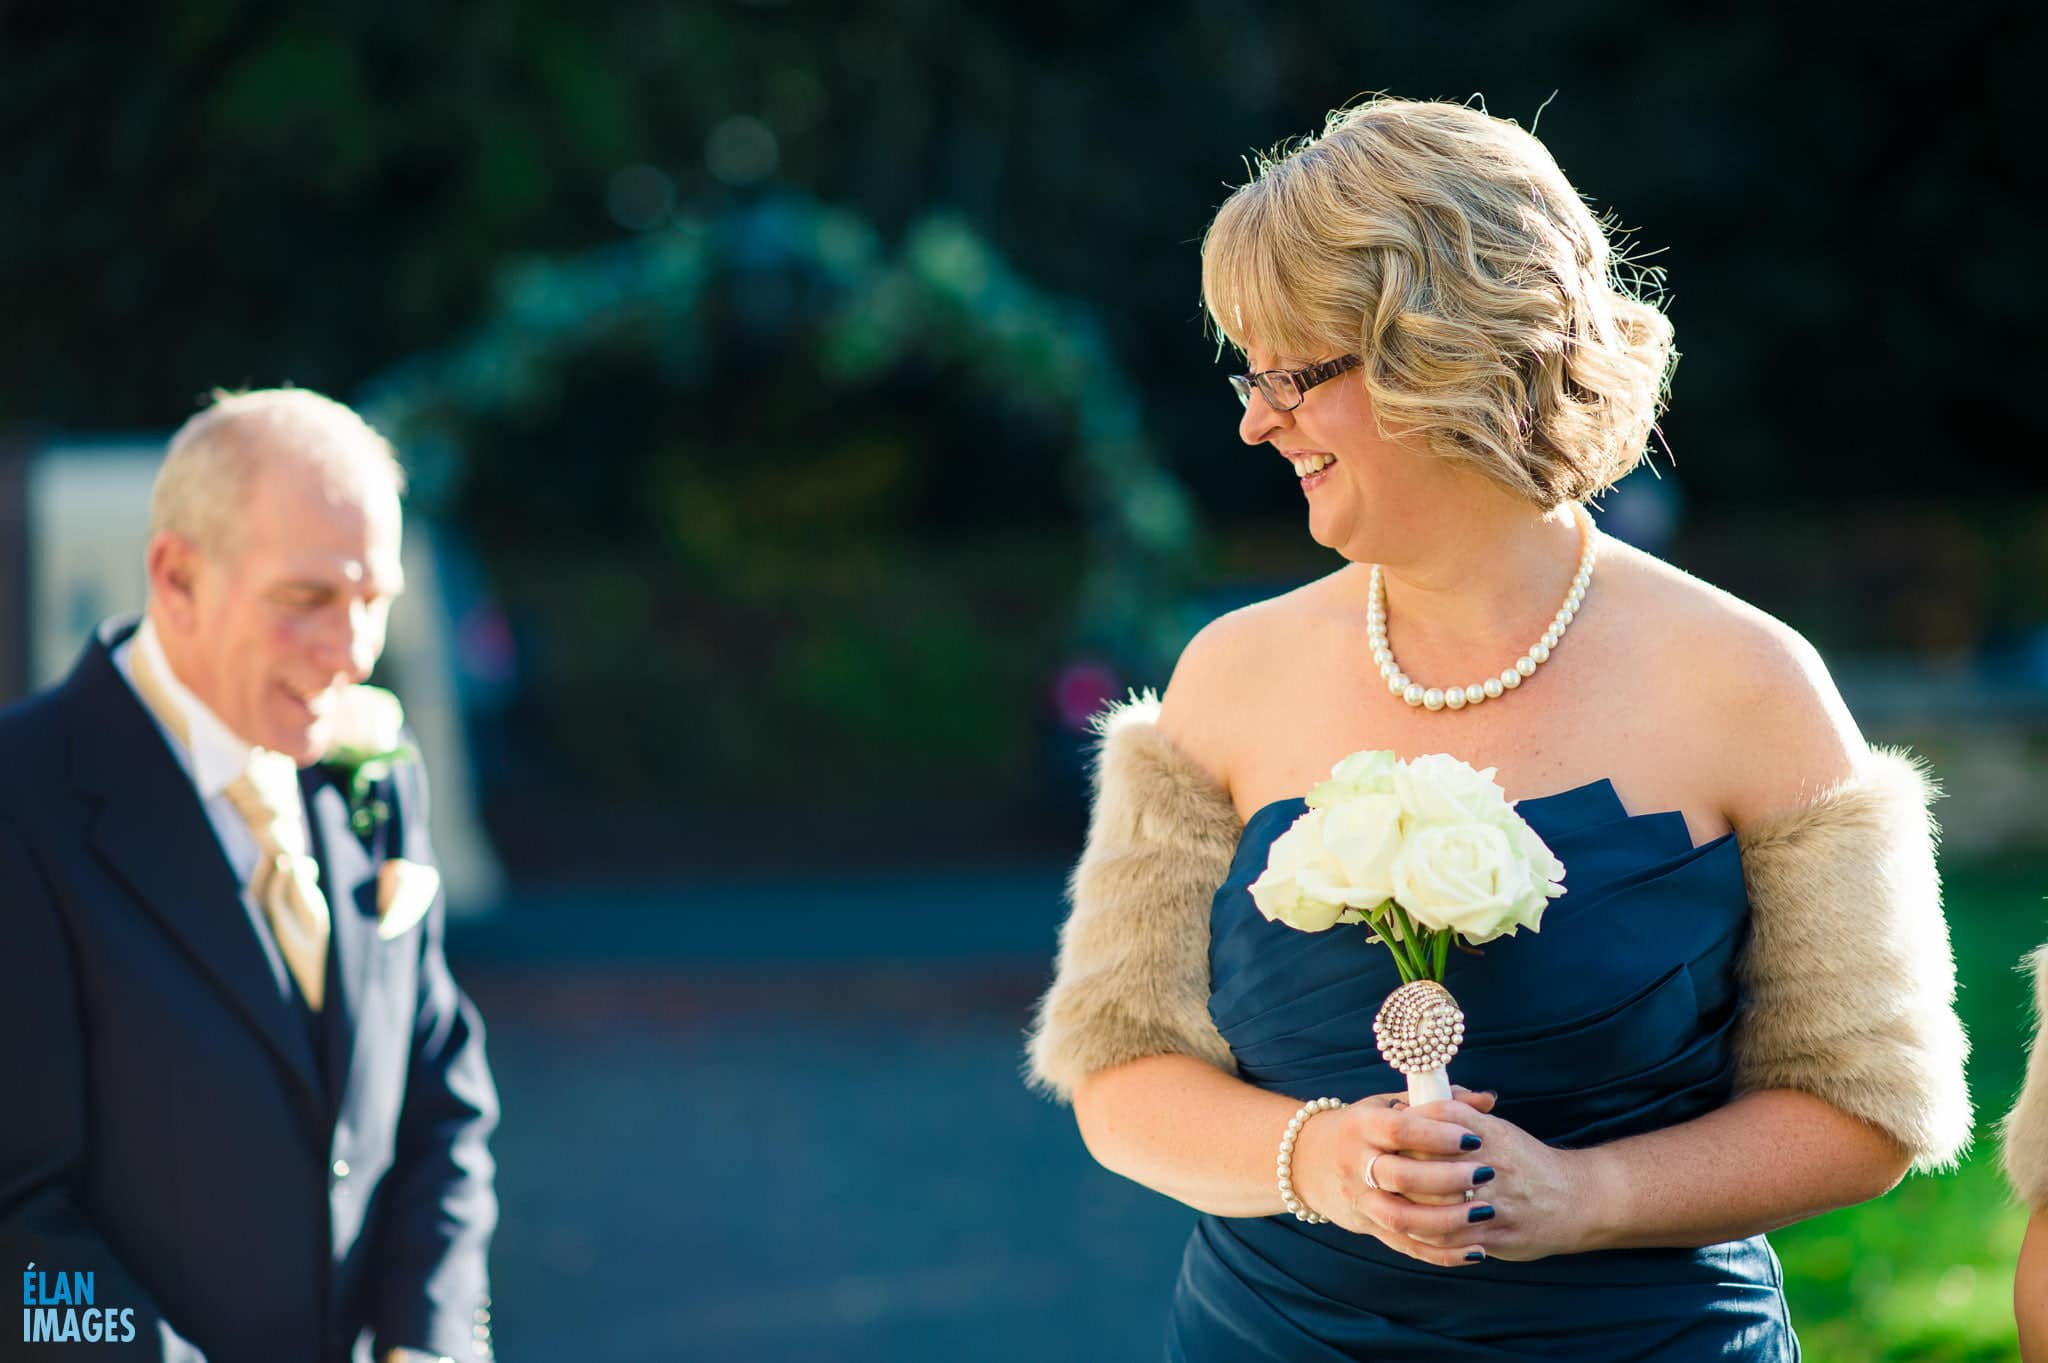 Wedding at leigh park hotel -049